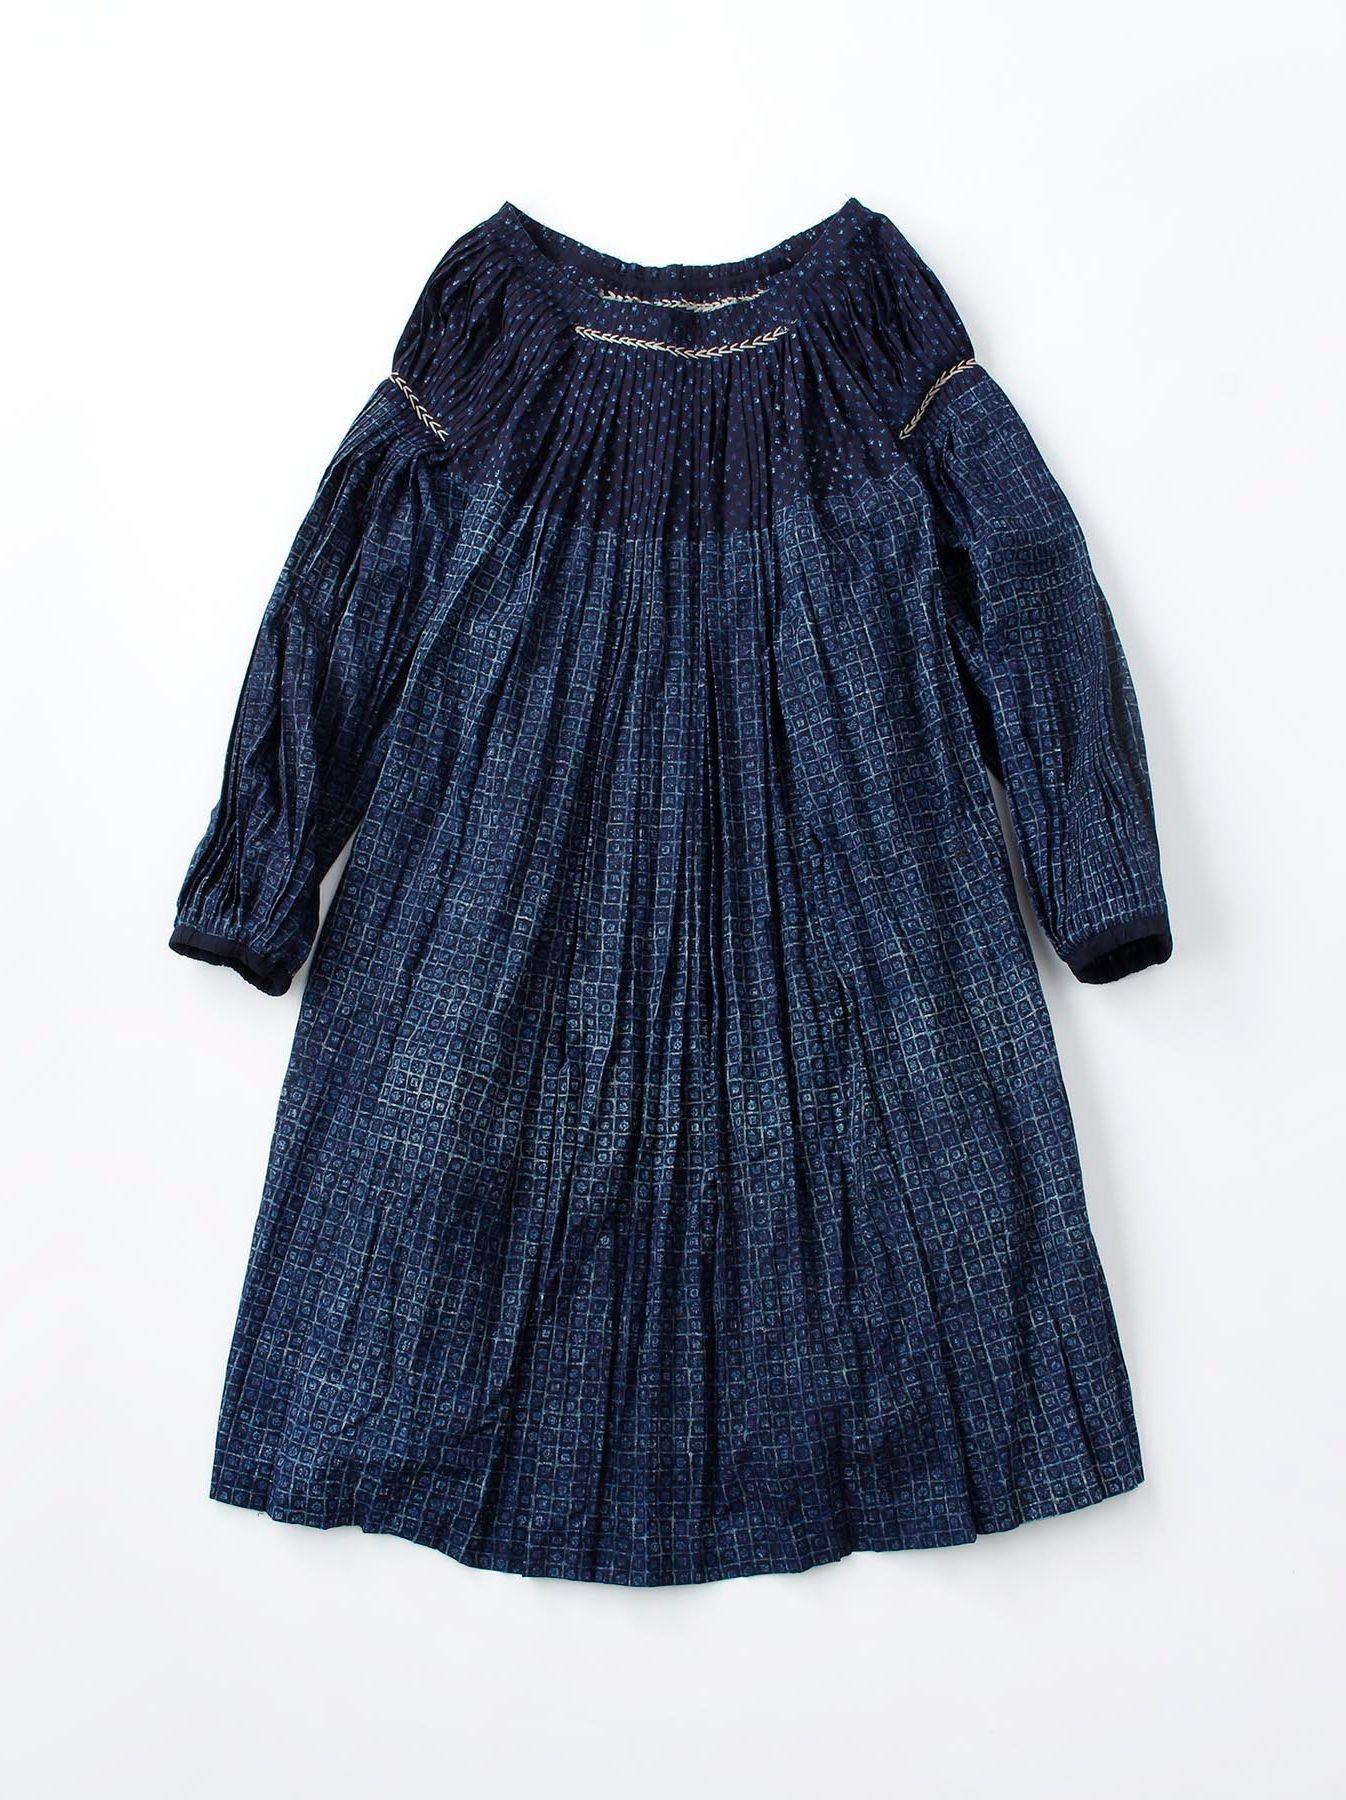 Indigo Patchwork Pleats Dress-1